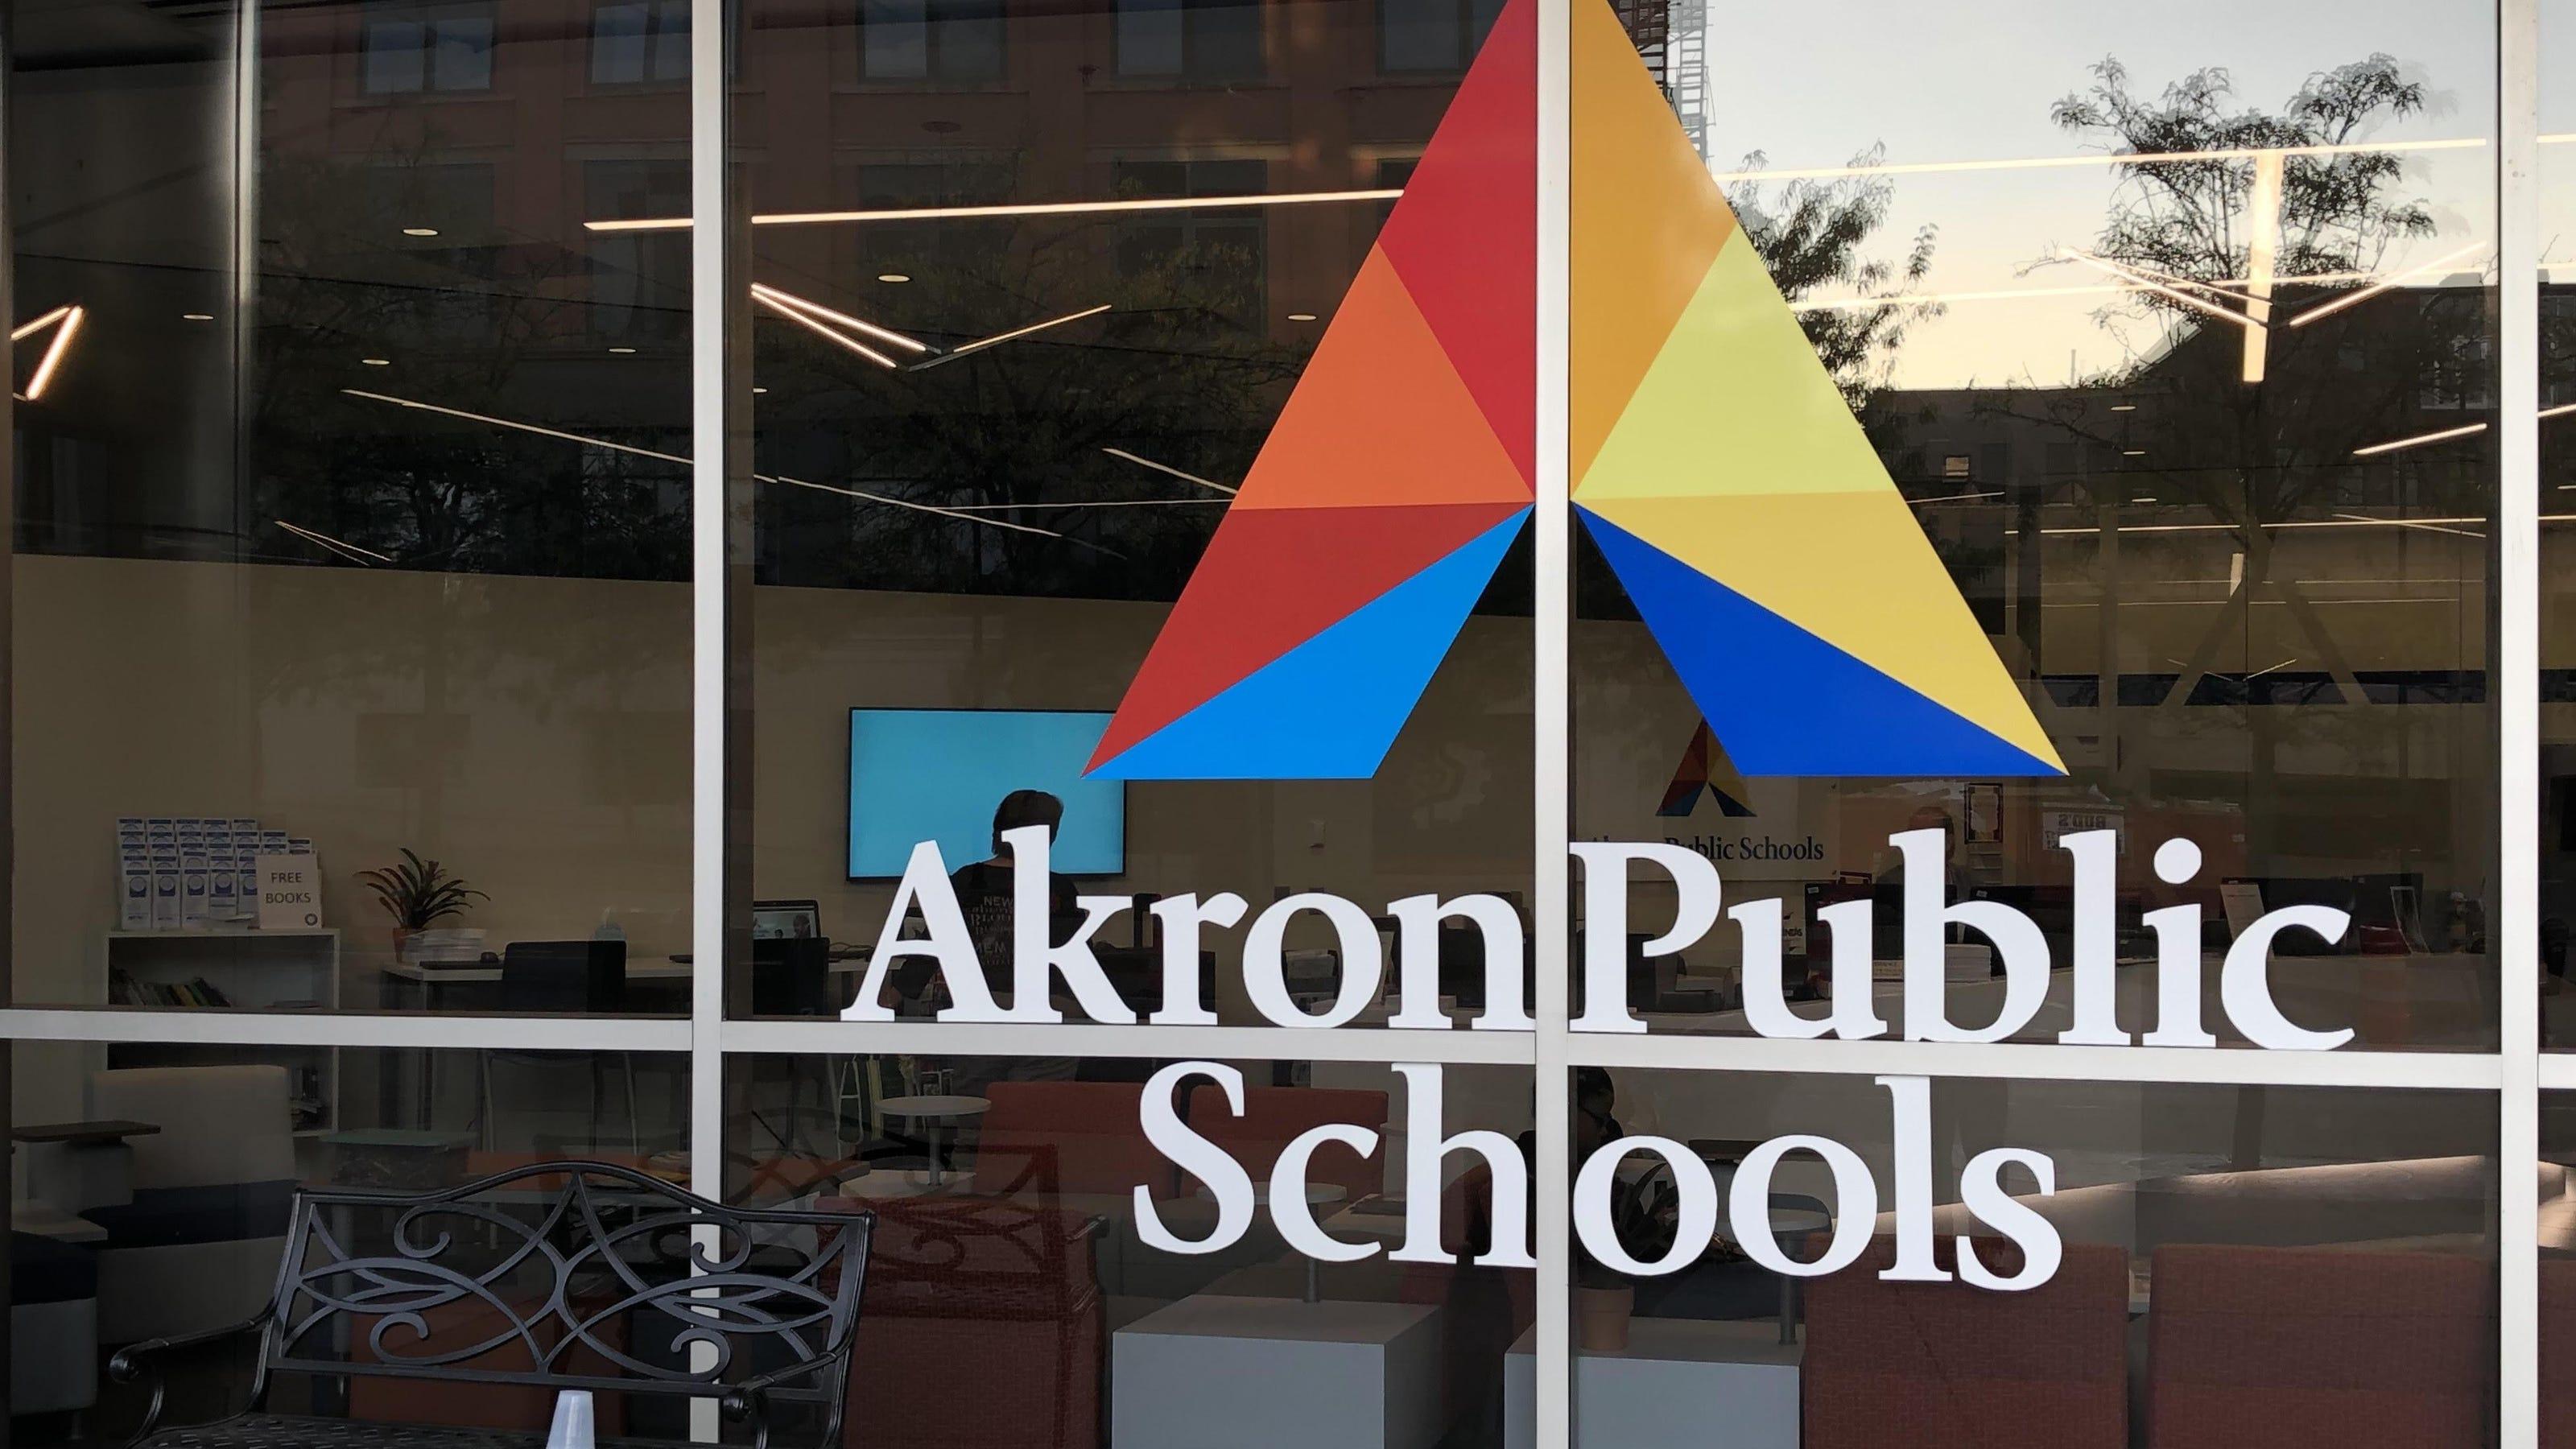 Akron Public Schools Calendar 2022.Akron Public Schools Expecting To Receive 40 Million In New Stimulus Funding